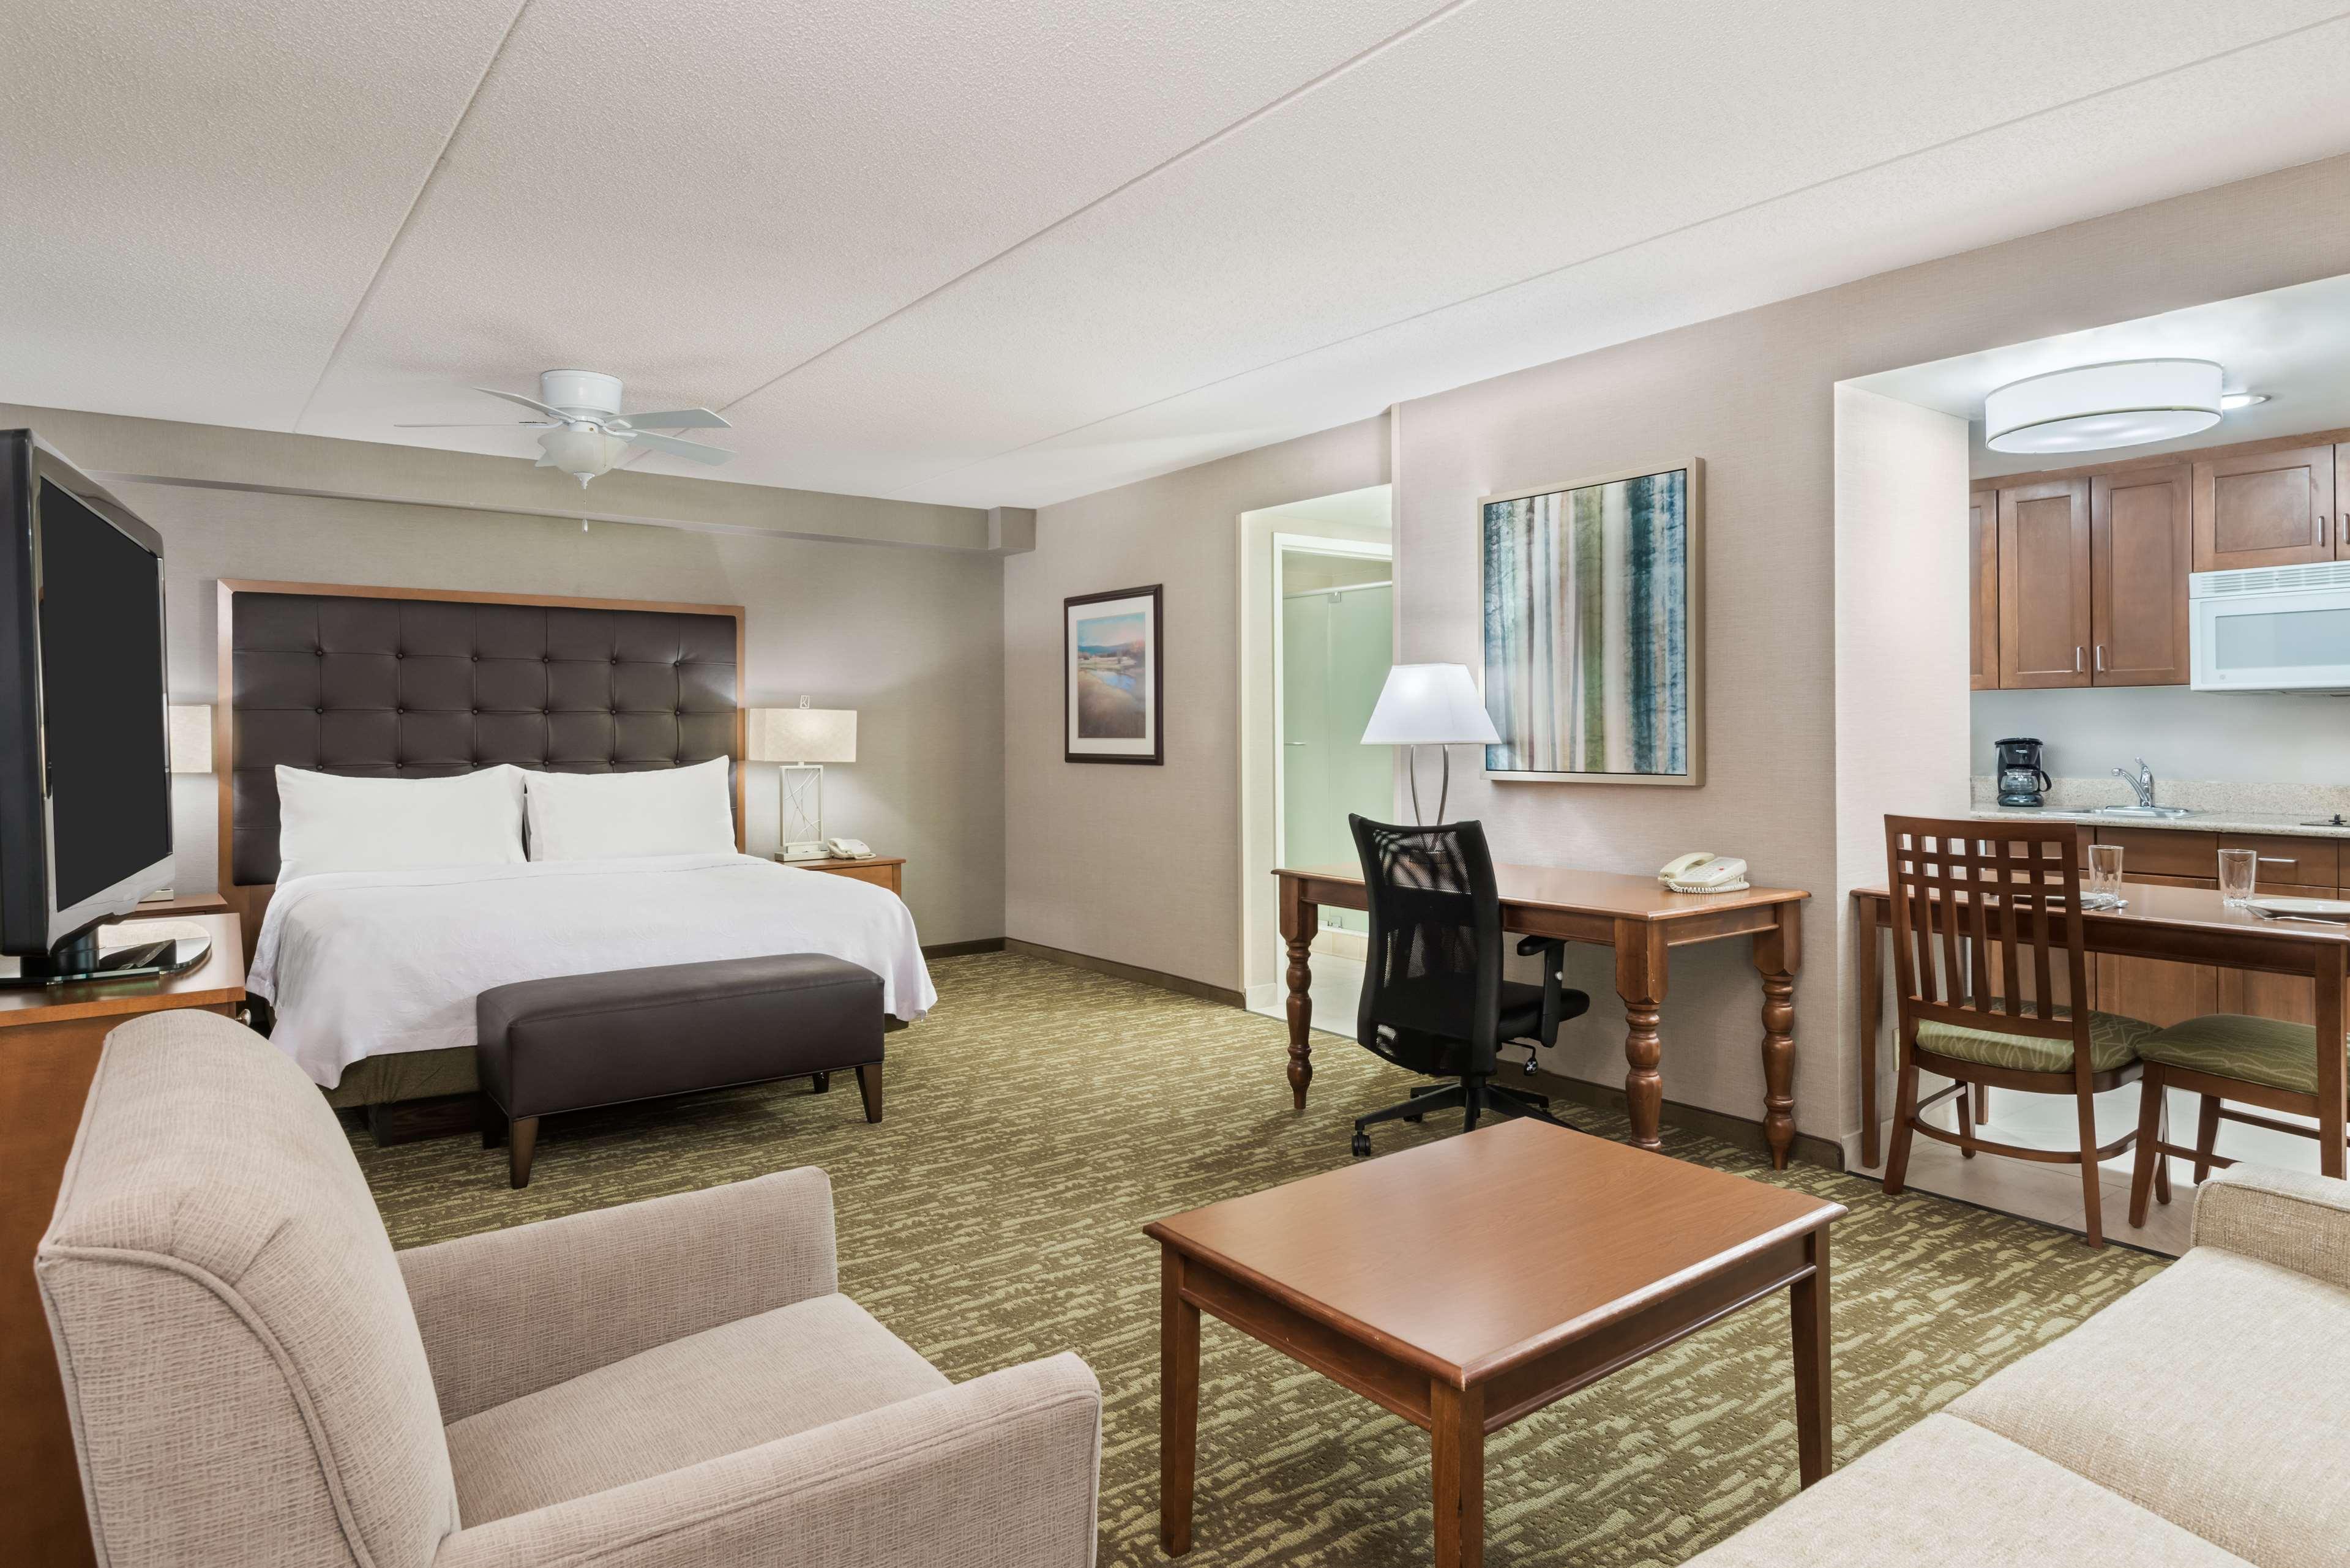 Homewood Suites by Hilton Holyoke-Springfield/North image 19